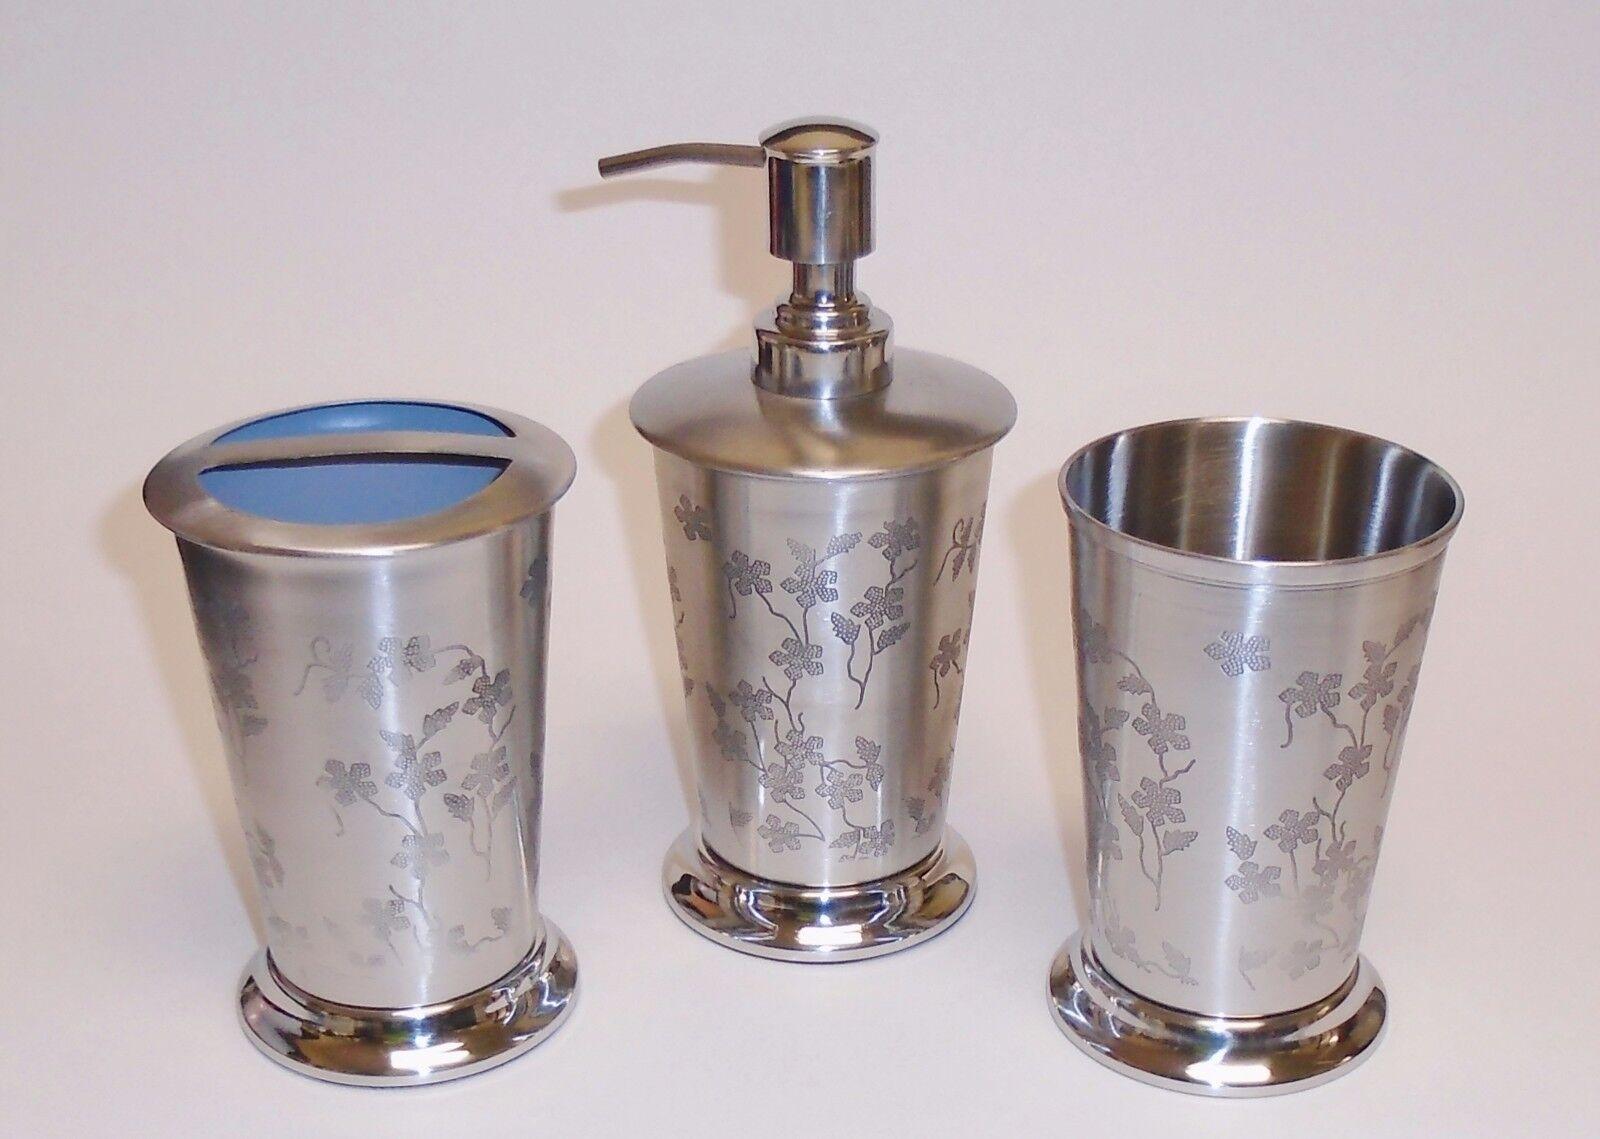 Neu 3 Stück Silberfarben Metall Metall Metall Blaumenmuster Seifenspender +Zahnbürsten Halter+ 7e6325